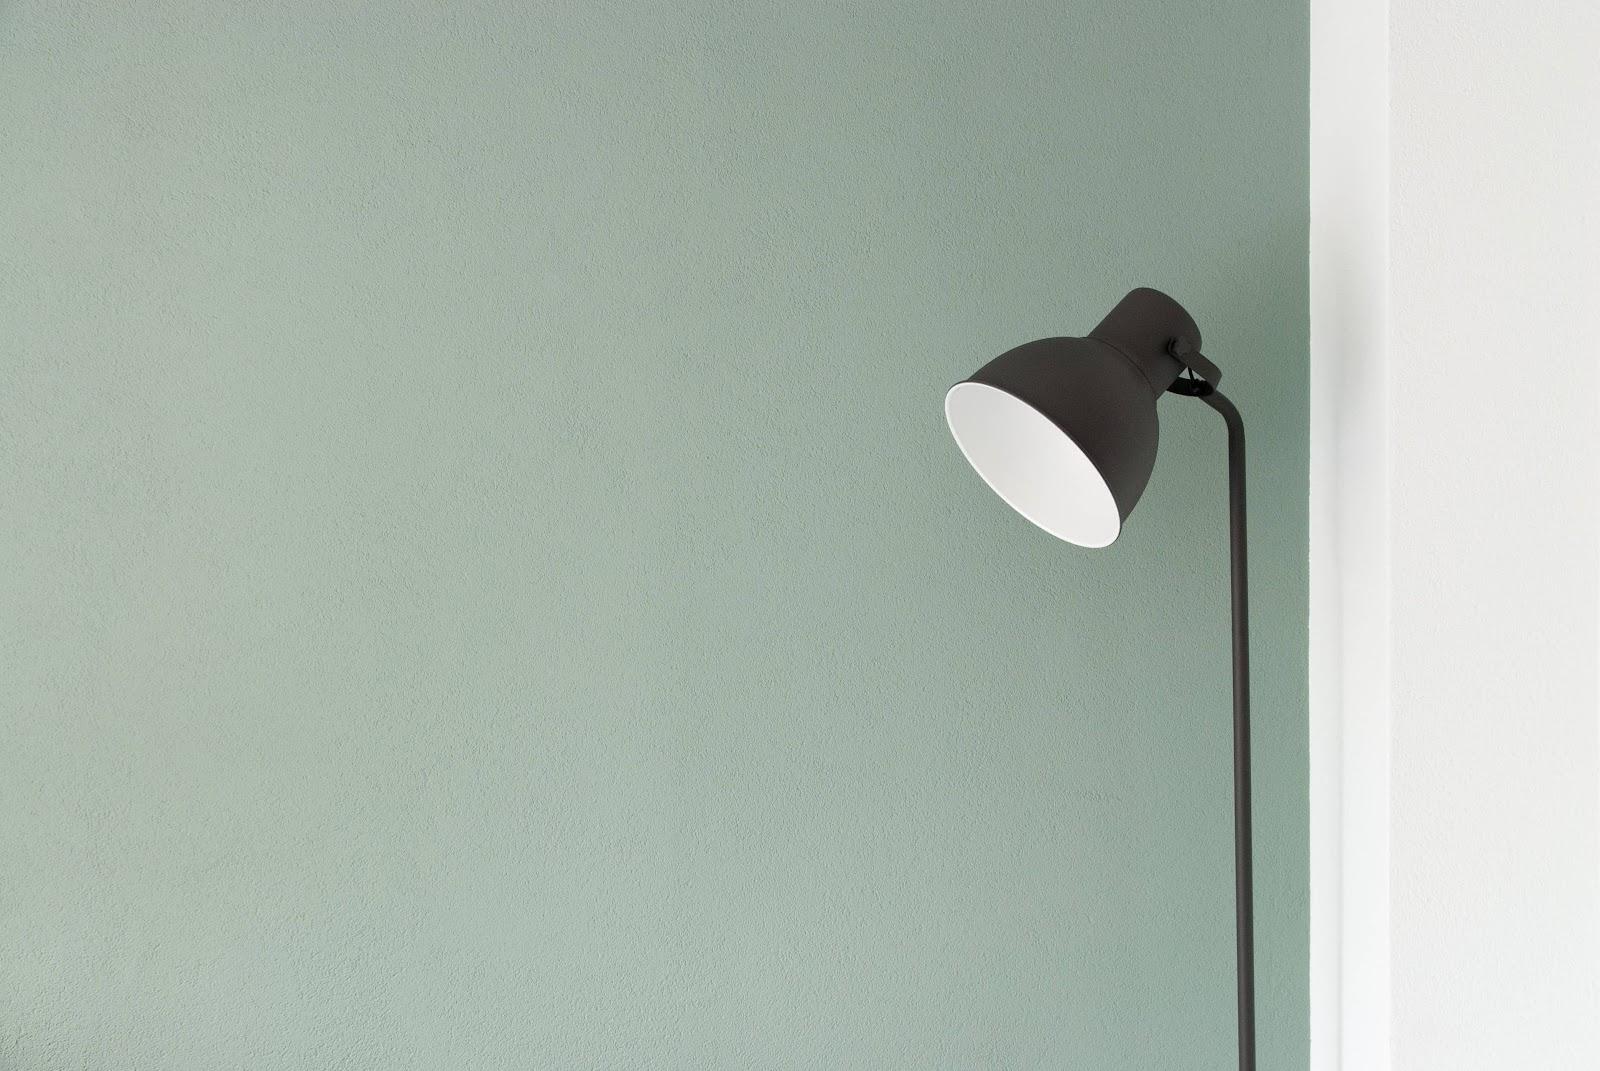 lampada-nera-luce-bianca